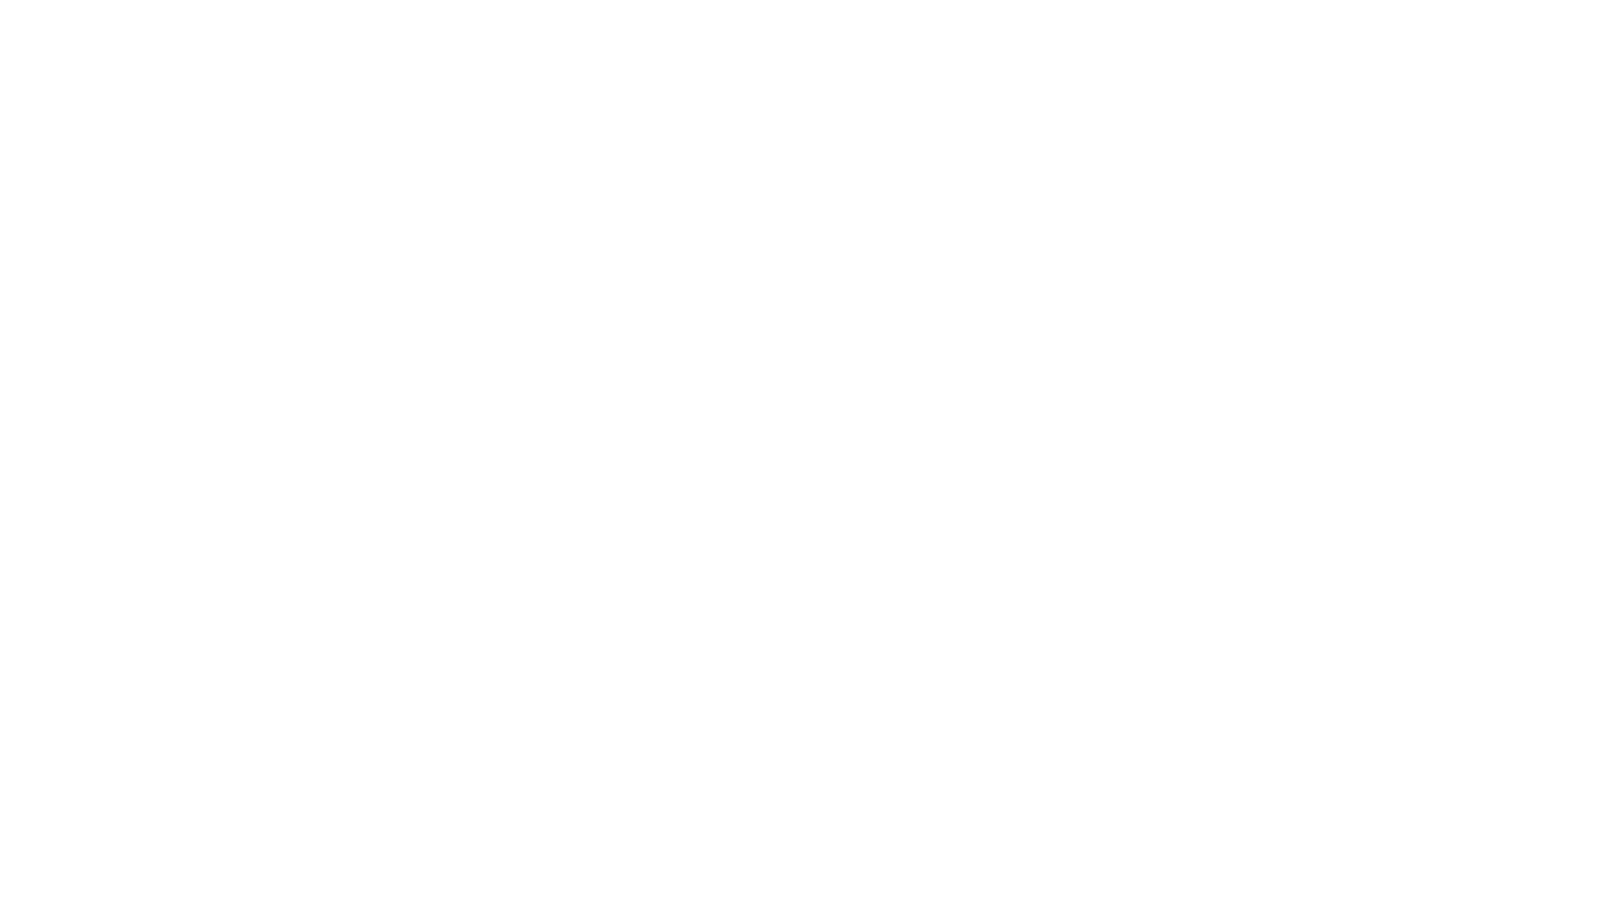 Cinematic 8K - Hellblade: Senua's Sacrifice - Game PC #games #cinematic #8k